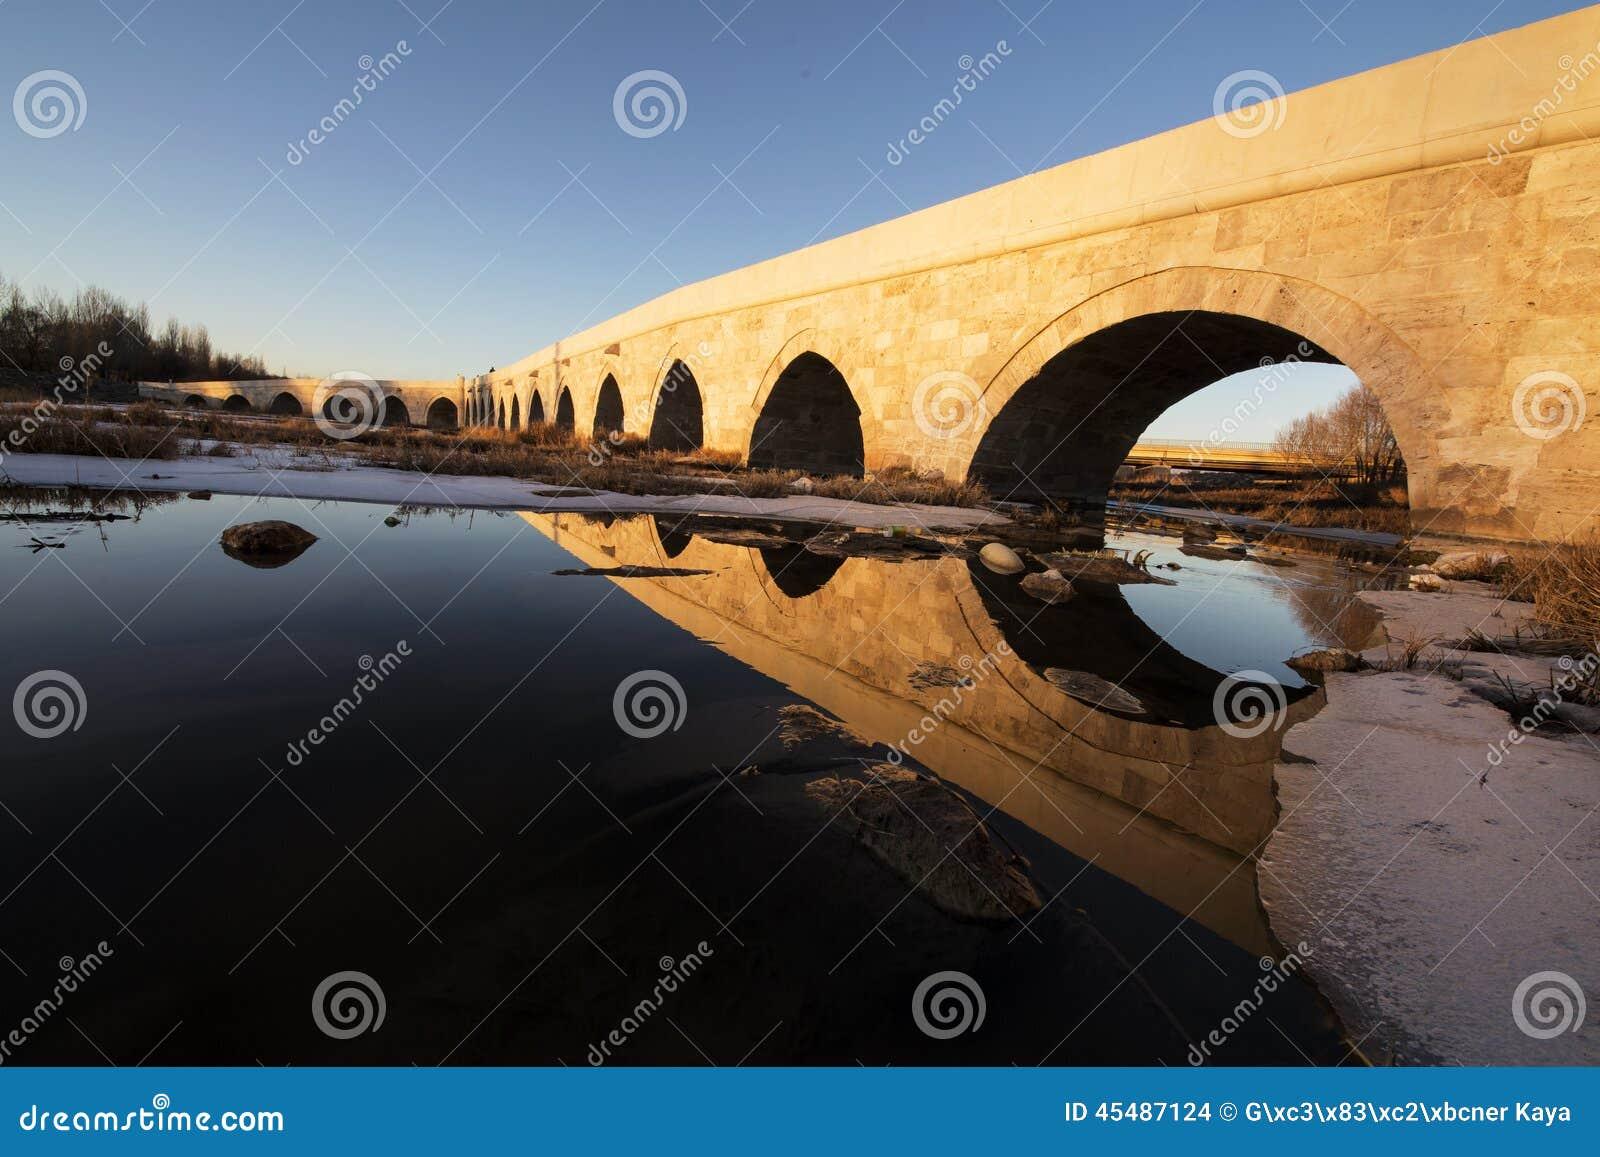 Egri桥梁